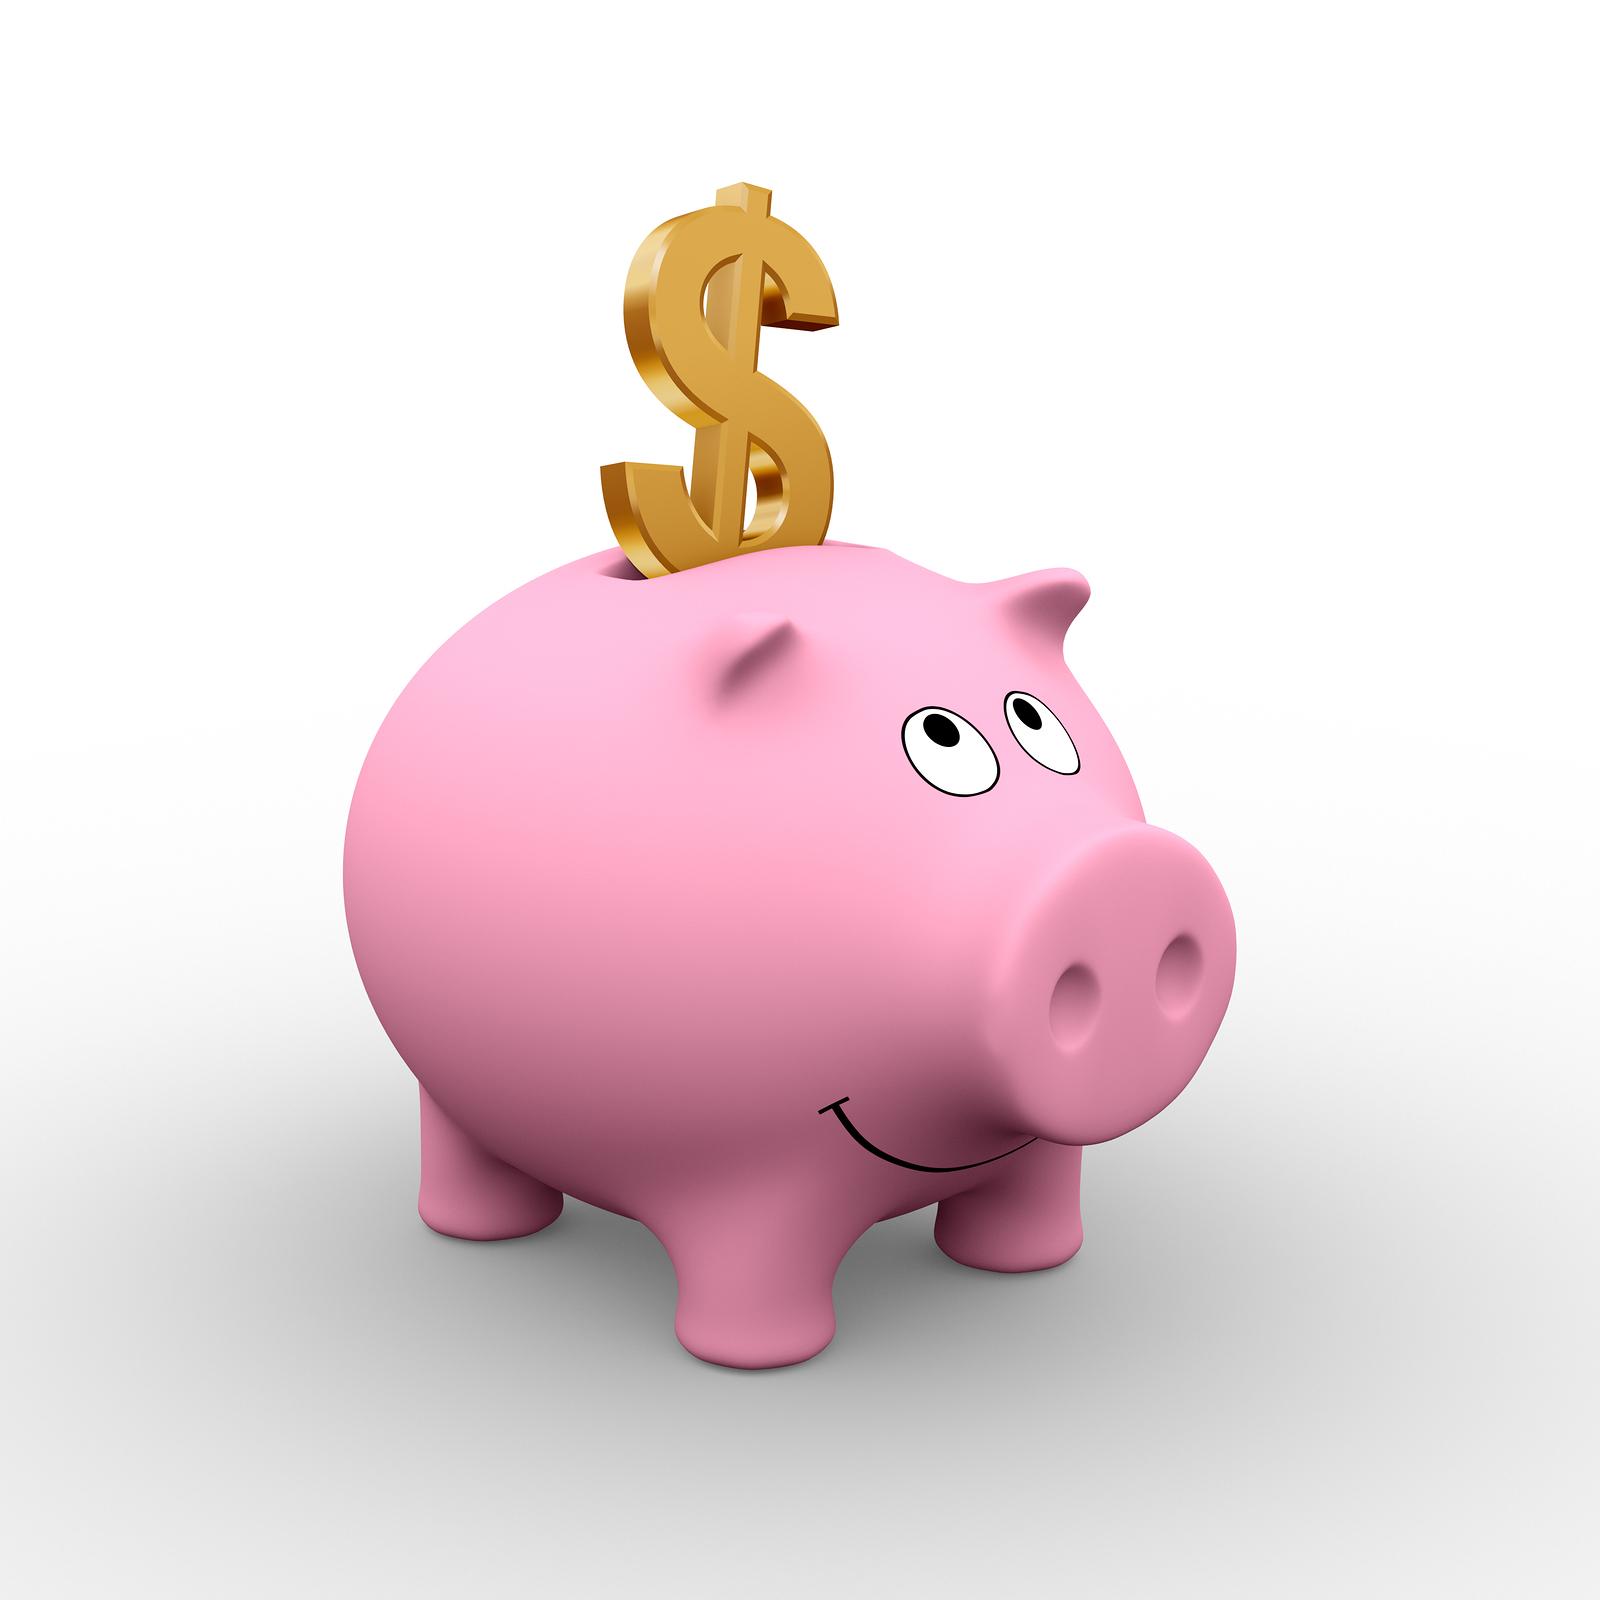 Saving for a house piggy bank